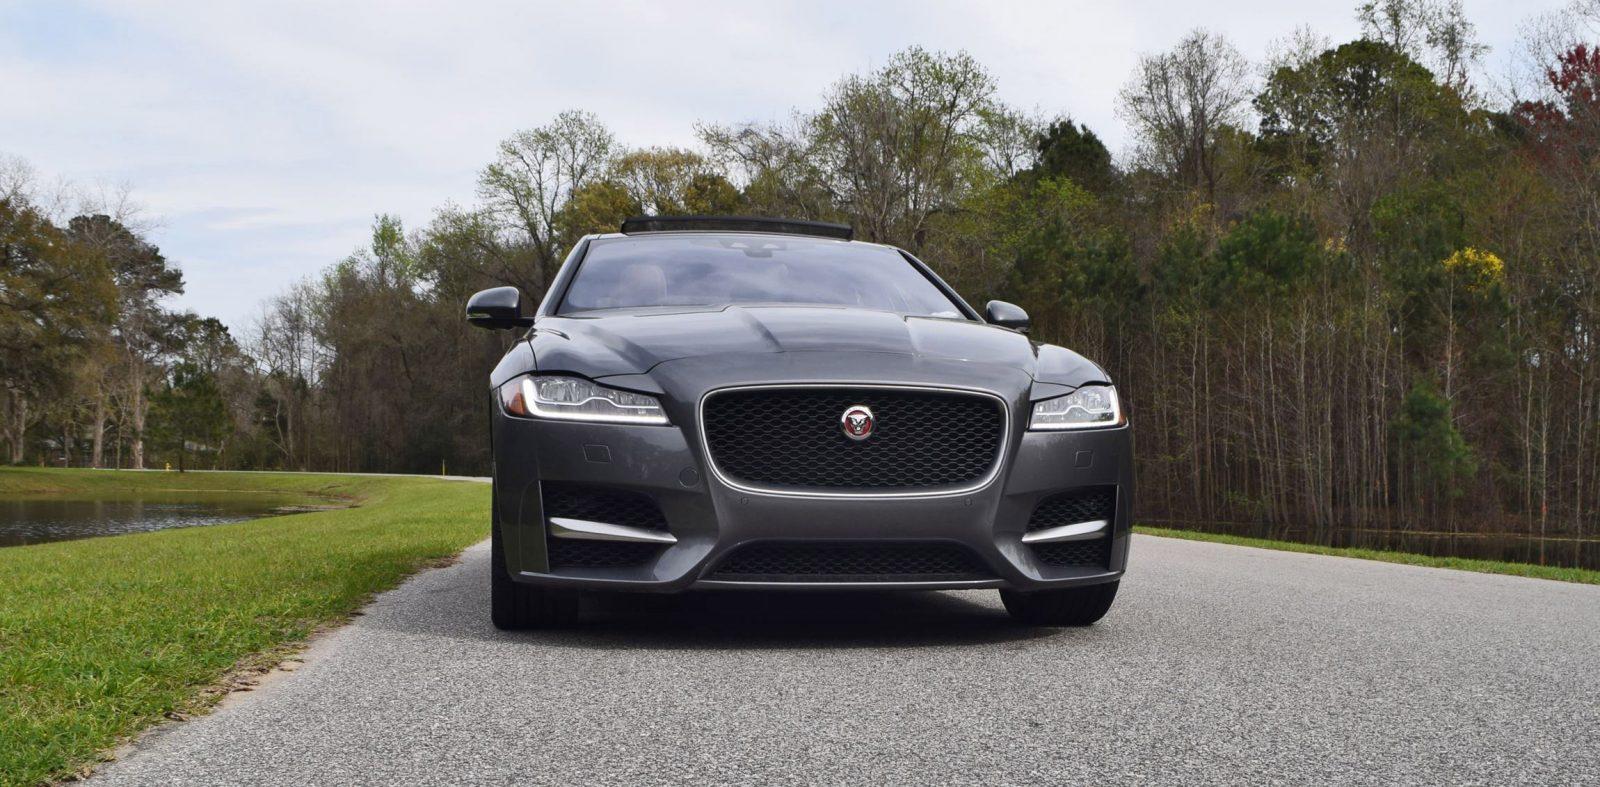 hd road test review 2016 jaguar xf 35t r sport rwd car revs. Black Bedroom Furniture Sets. Home Design Ideas